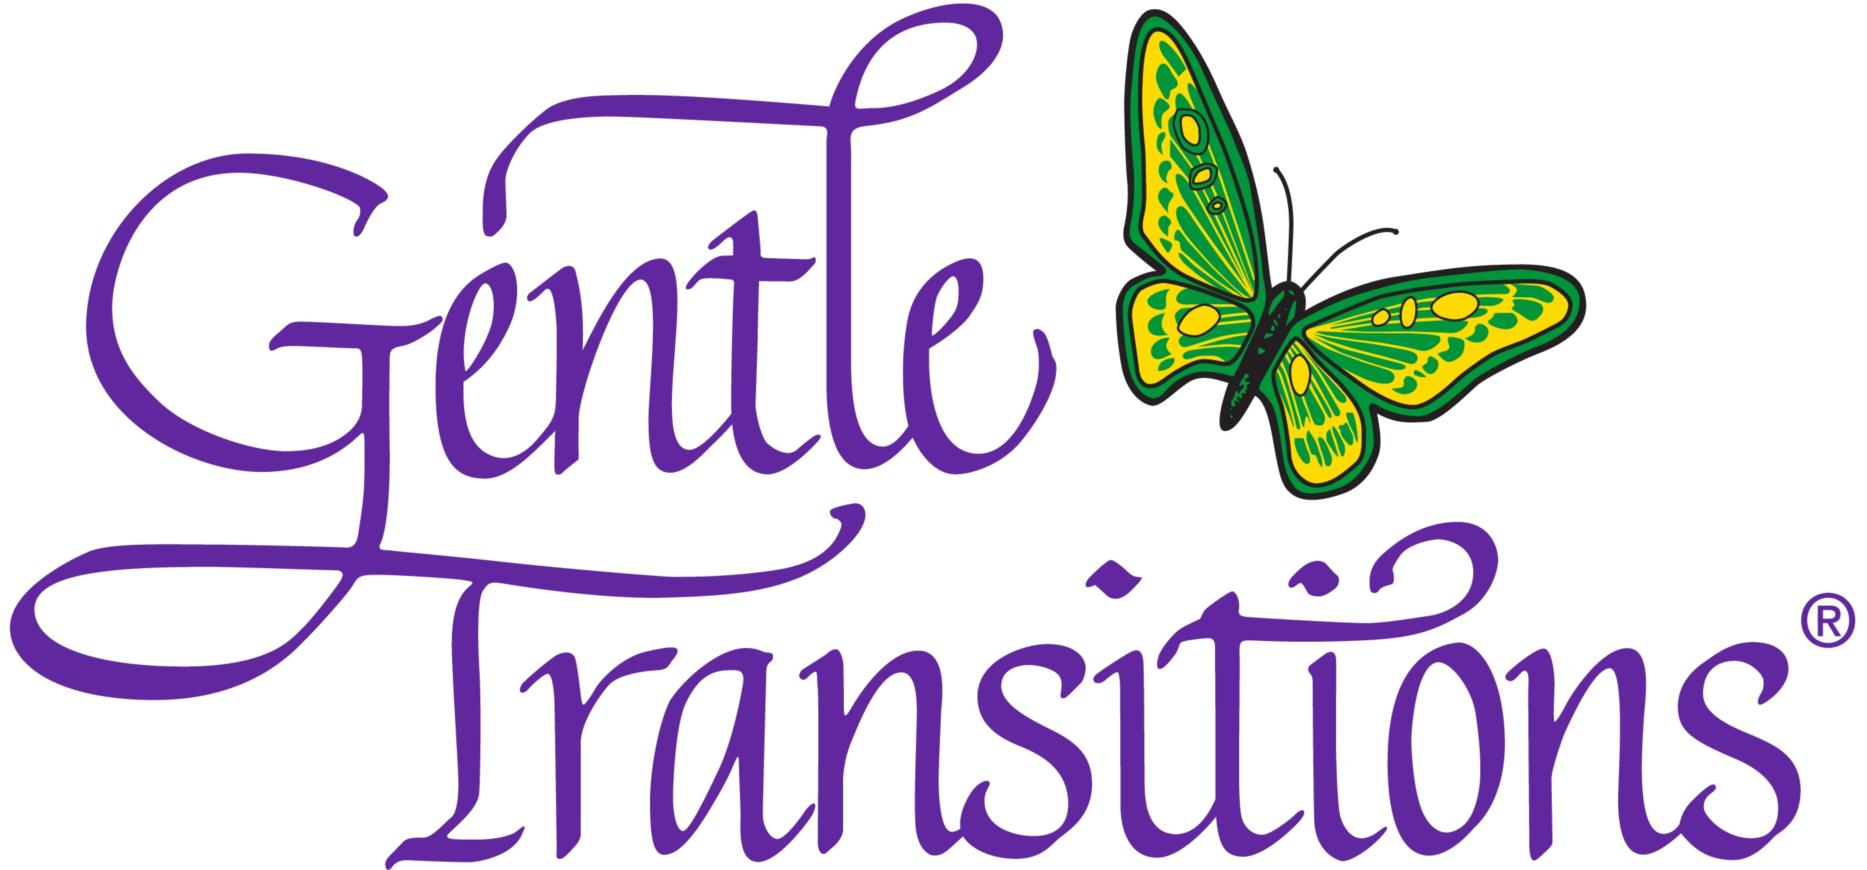 Gentle Transitions logo